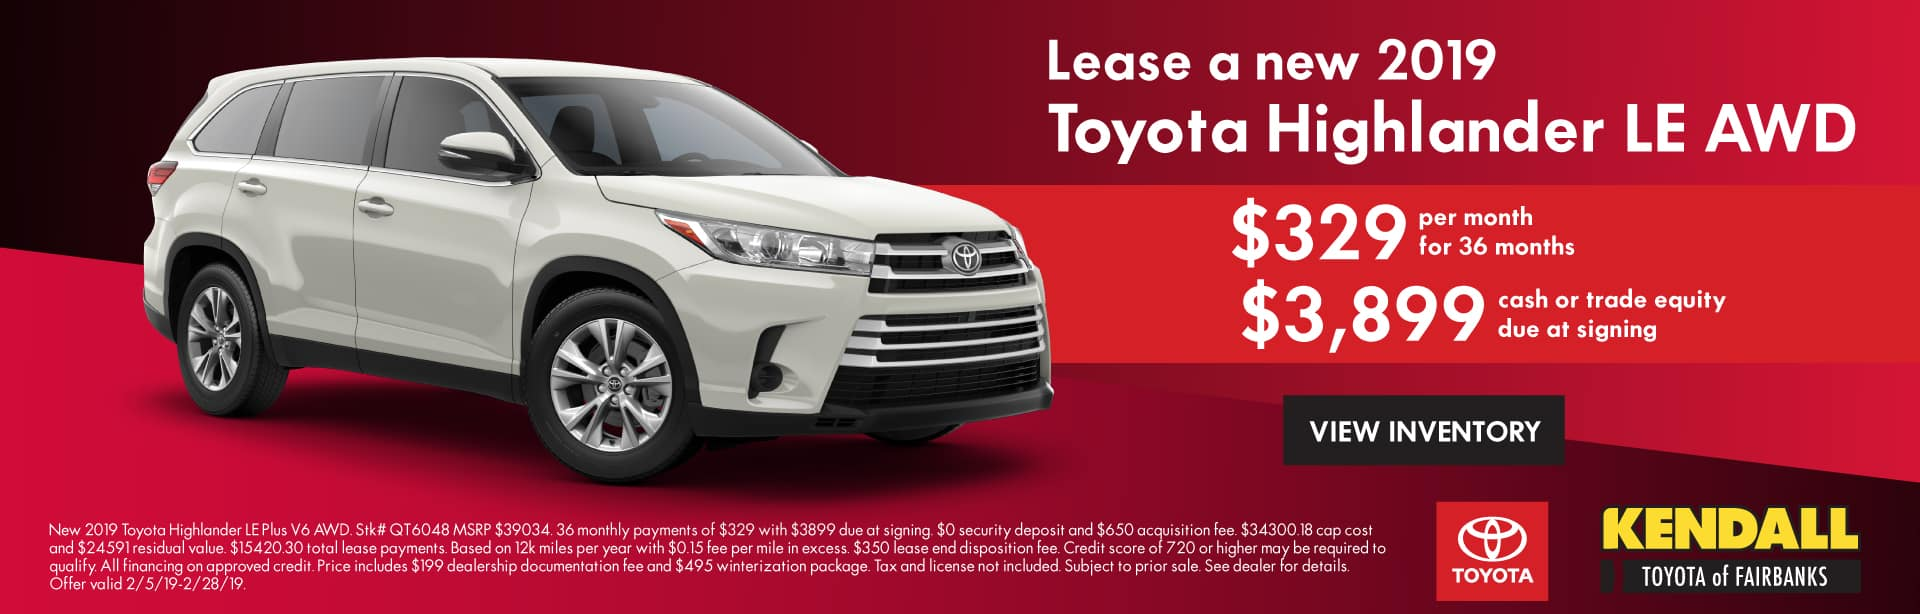 Kendall Toyota Fairbanks >> Kendall Toyota Of Fairbanks New Toyota Used Car Dealership In